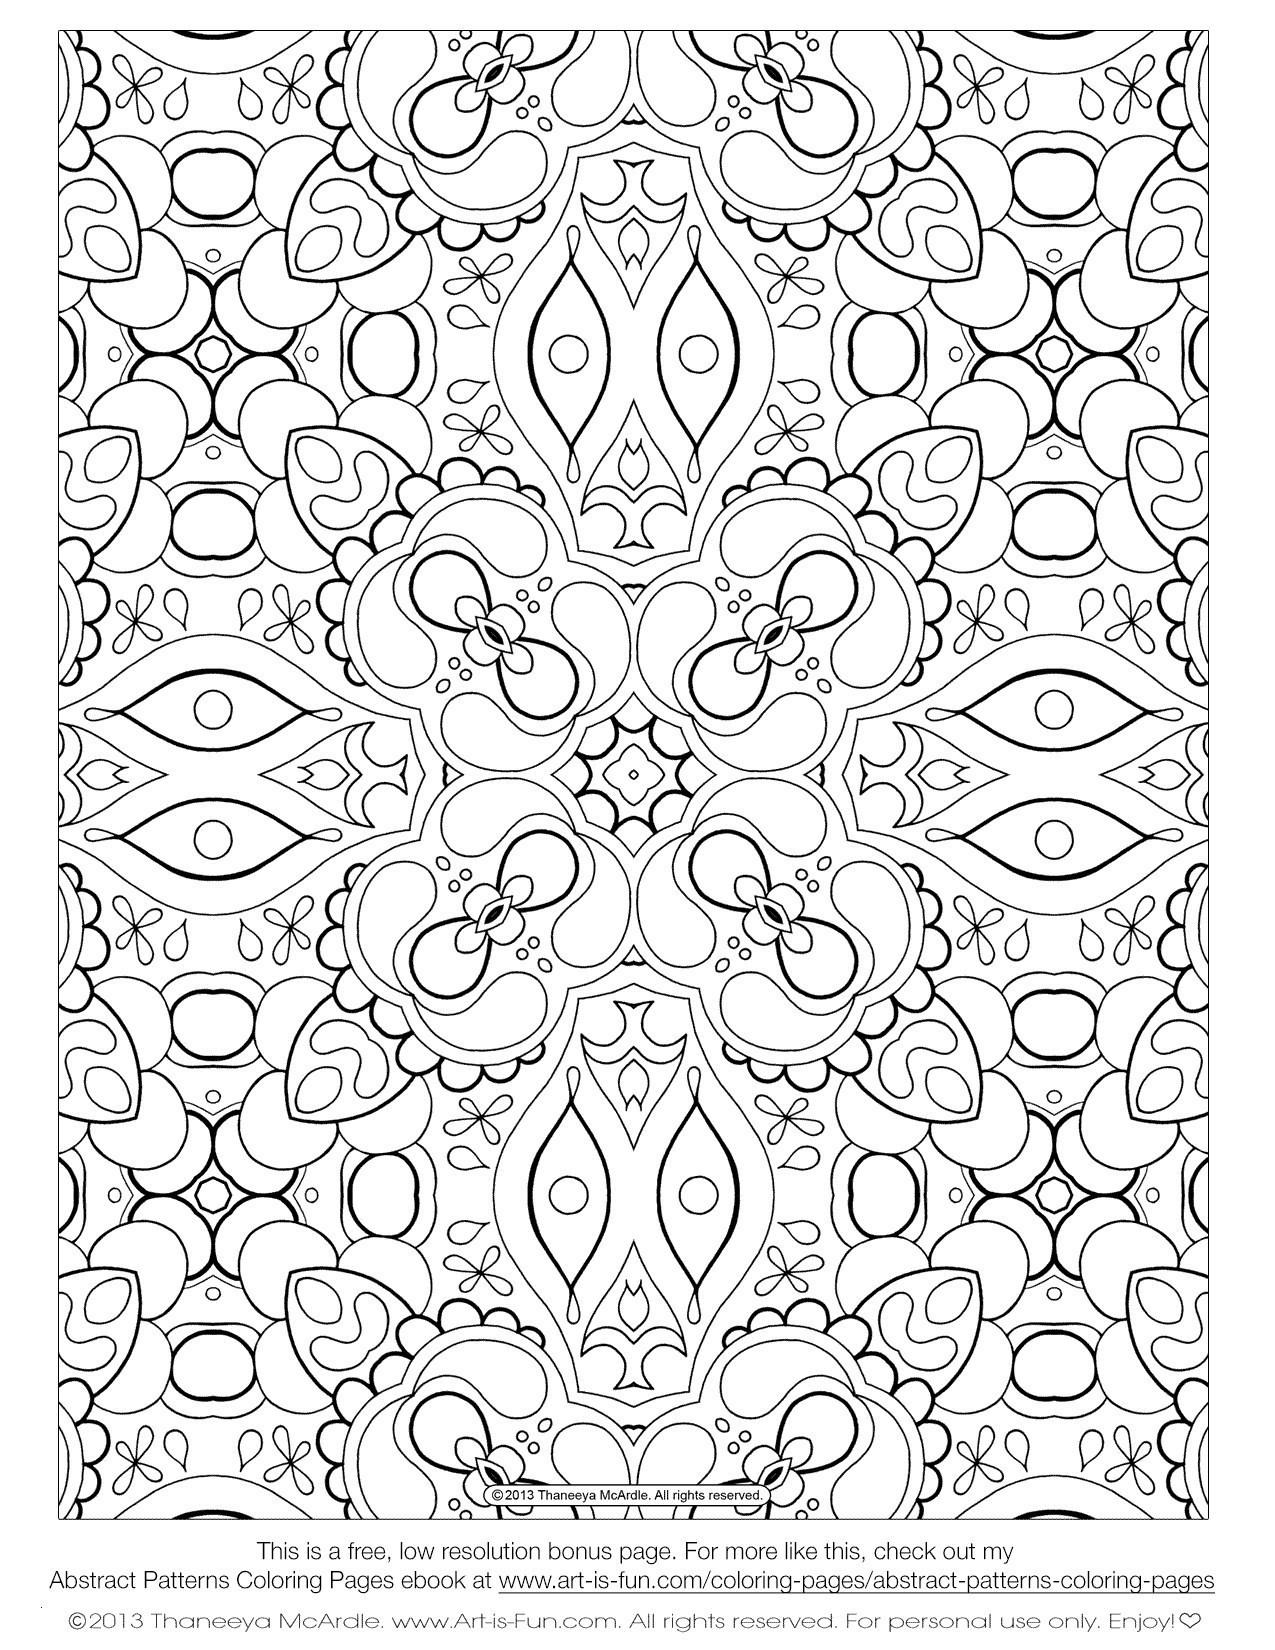 Malvorlage Blumen ornamente Genial ornament Drucken Angenehm 40 Malvorlagen ornamente Blumen Das Bild